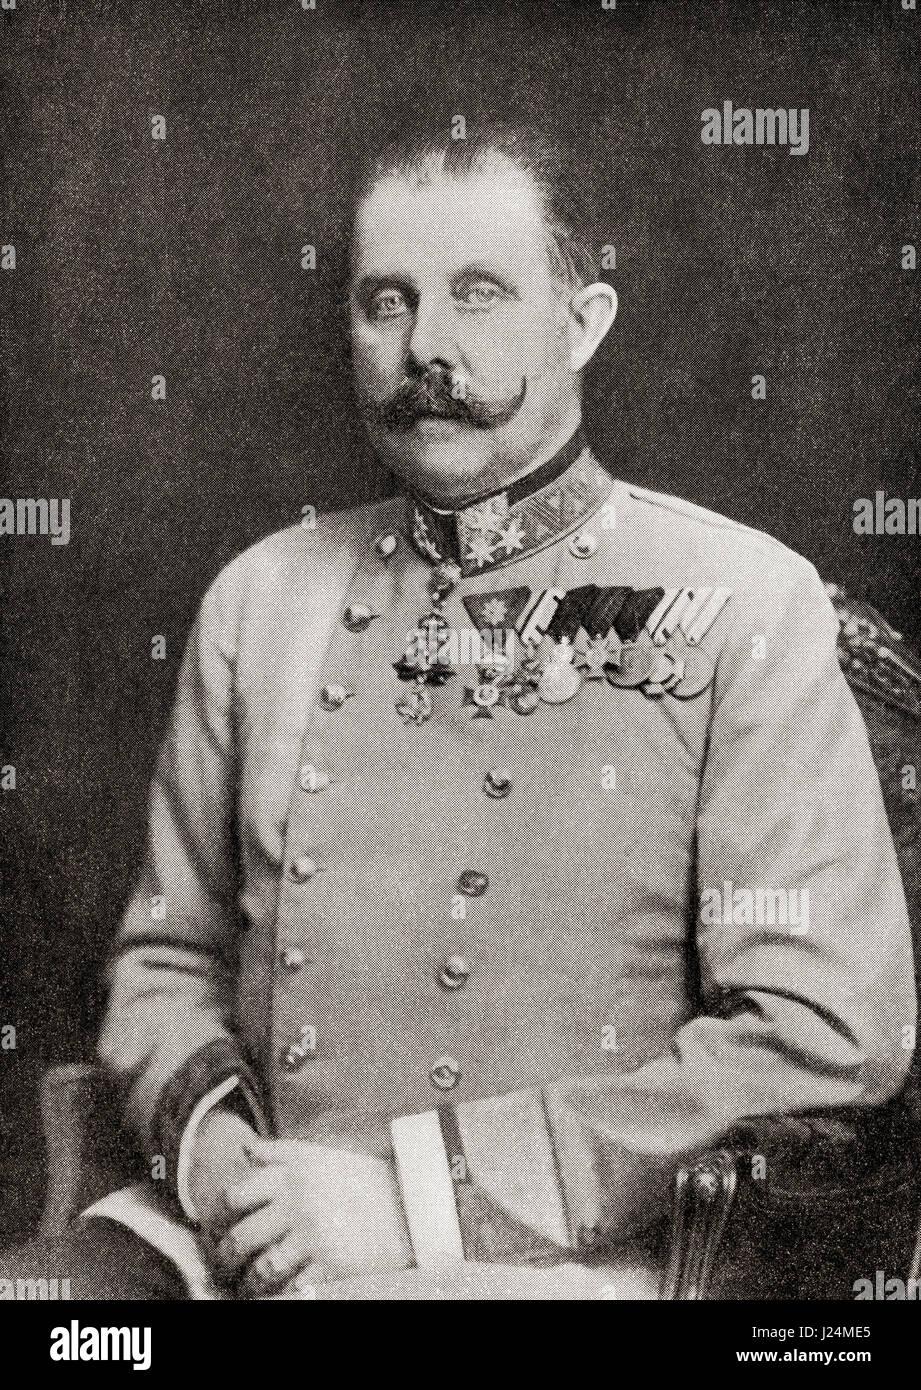 Franz Ferdinand Carl Ludwig Joseph Maria , 1863 – 1914.  Archduke of Austria-Este, Austro-Hungarian and Royal Prince - Stock Image